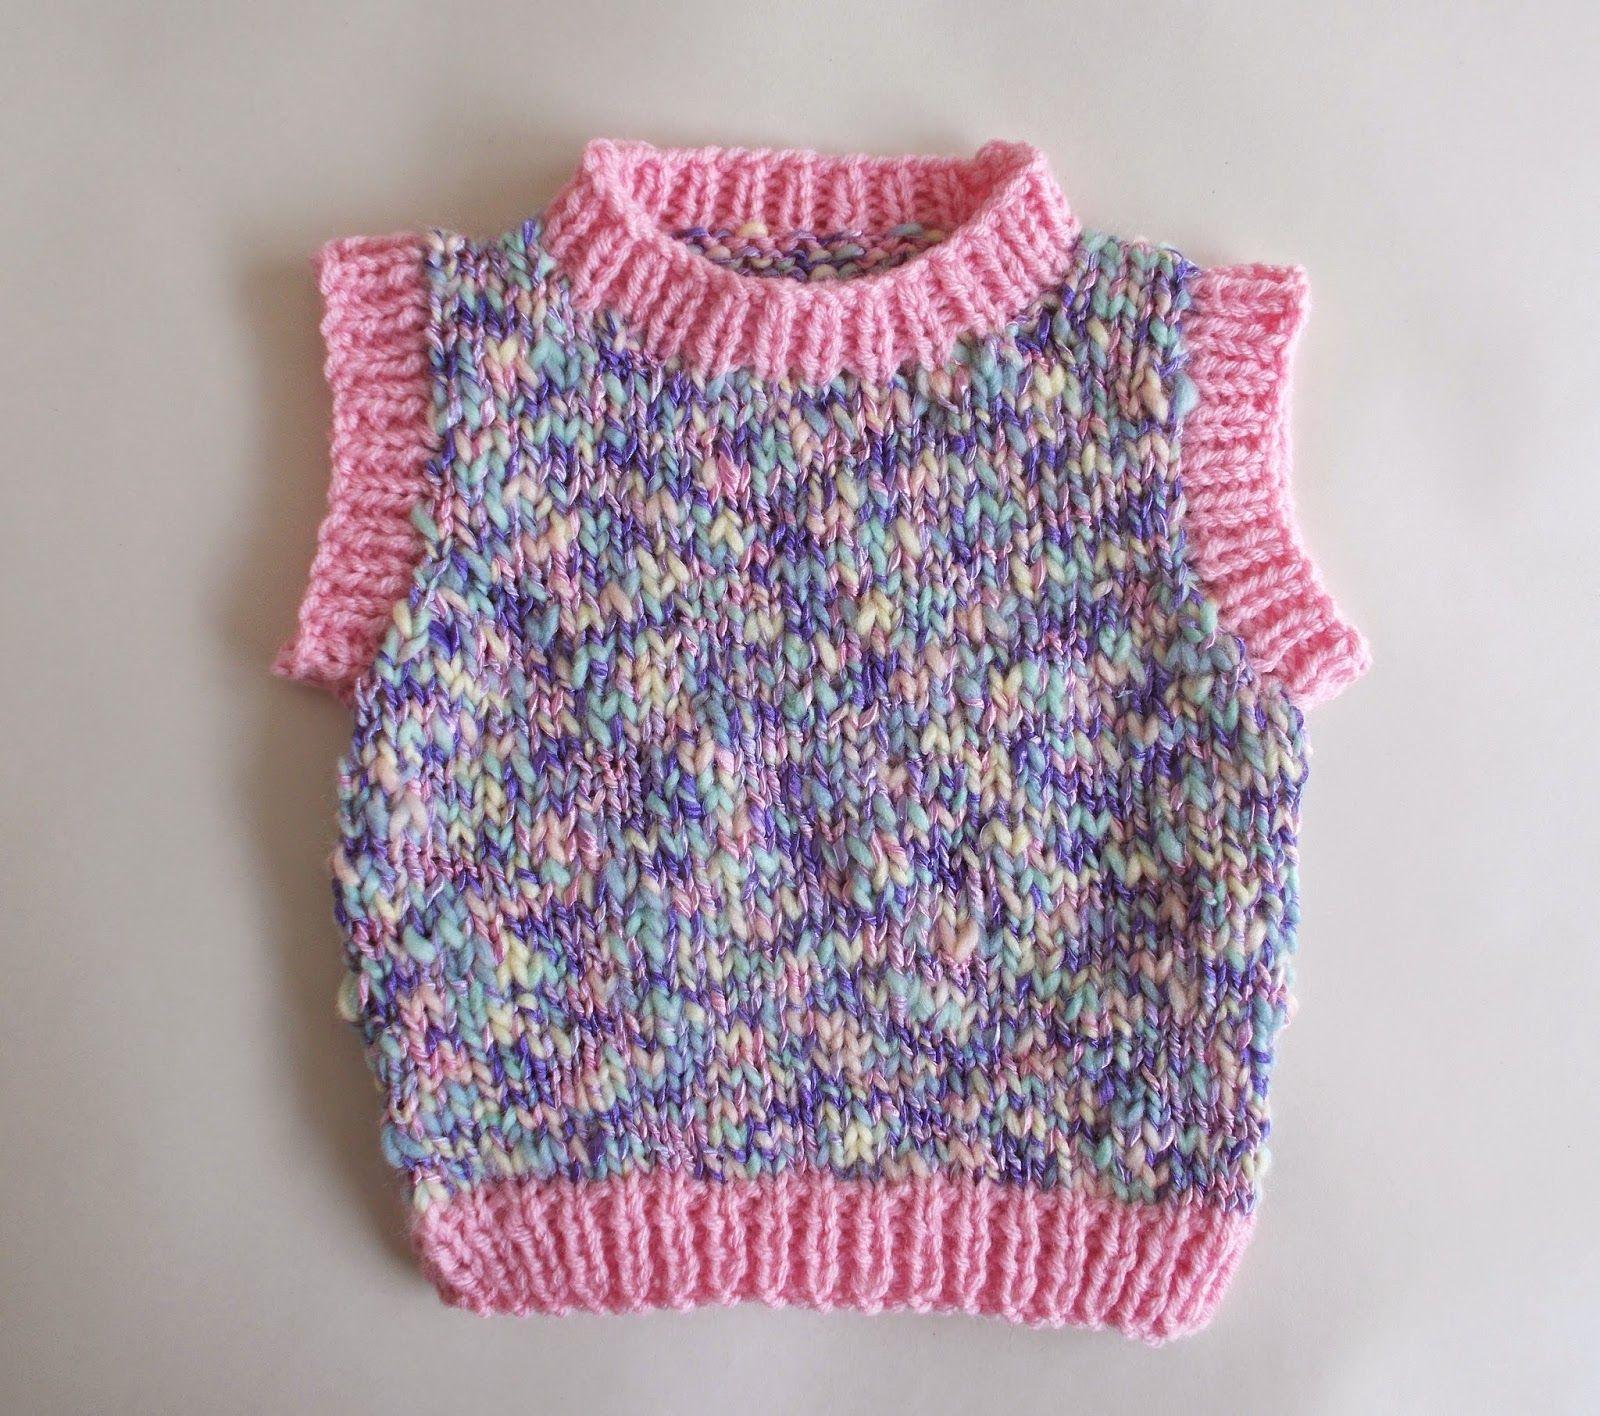 Moiselle chunky yarn sleeveless baby vest top mariannas lazy ravelry moiselle chunky sleeveless baby vest top pattern by marianna mel bankloansurffo Choice Image